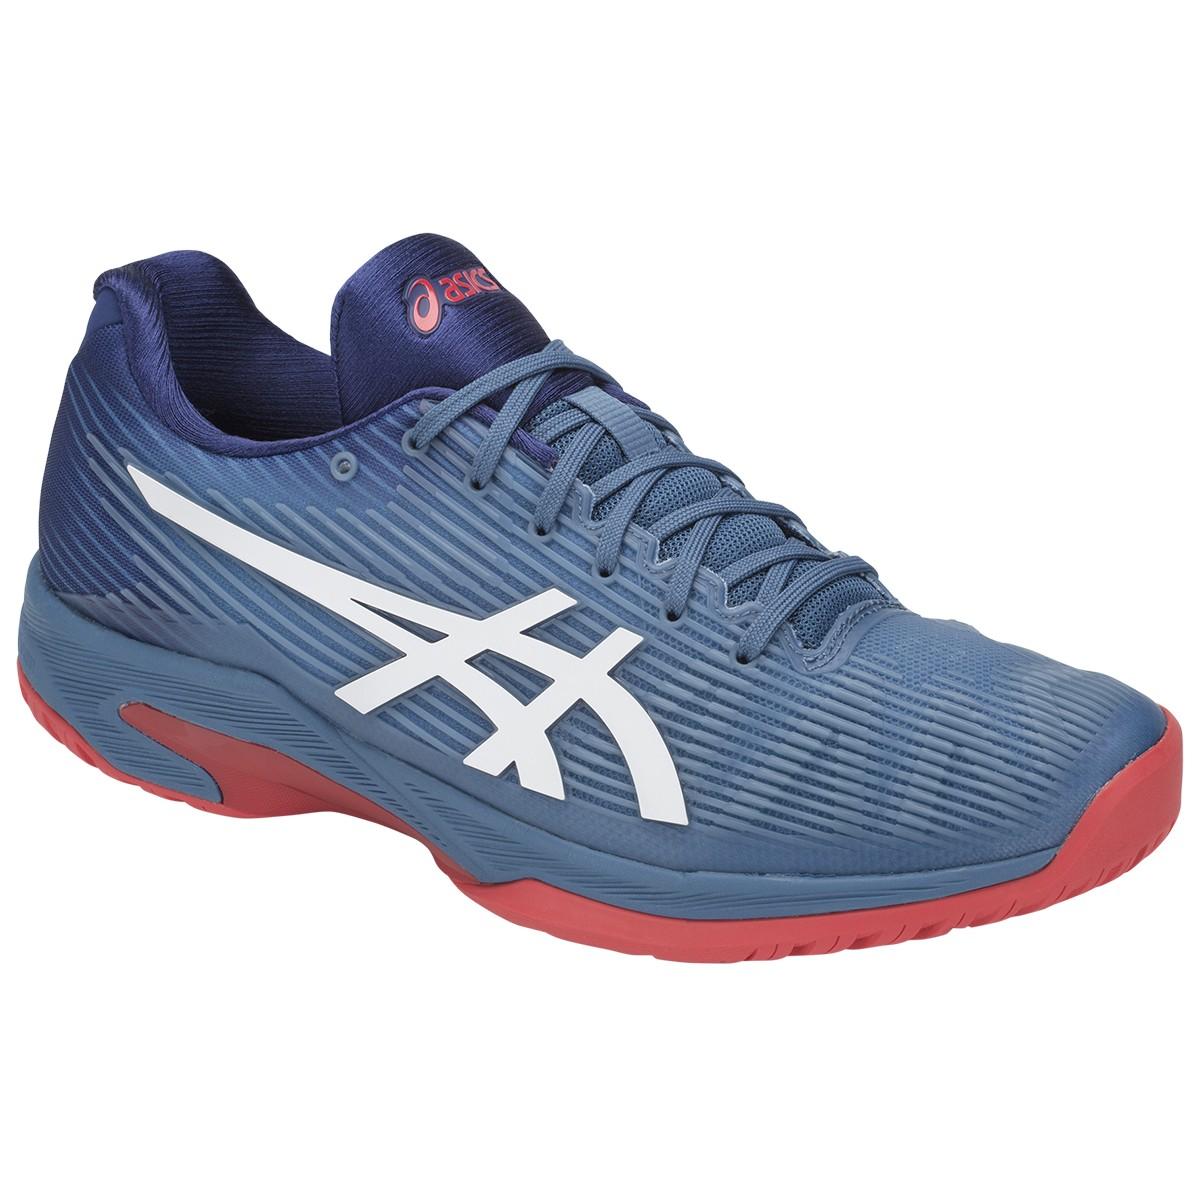 chaussures tennis asics homme cheap online